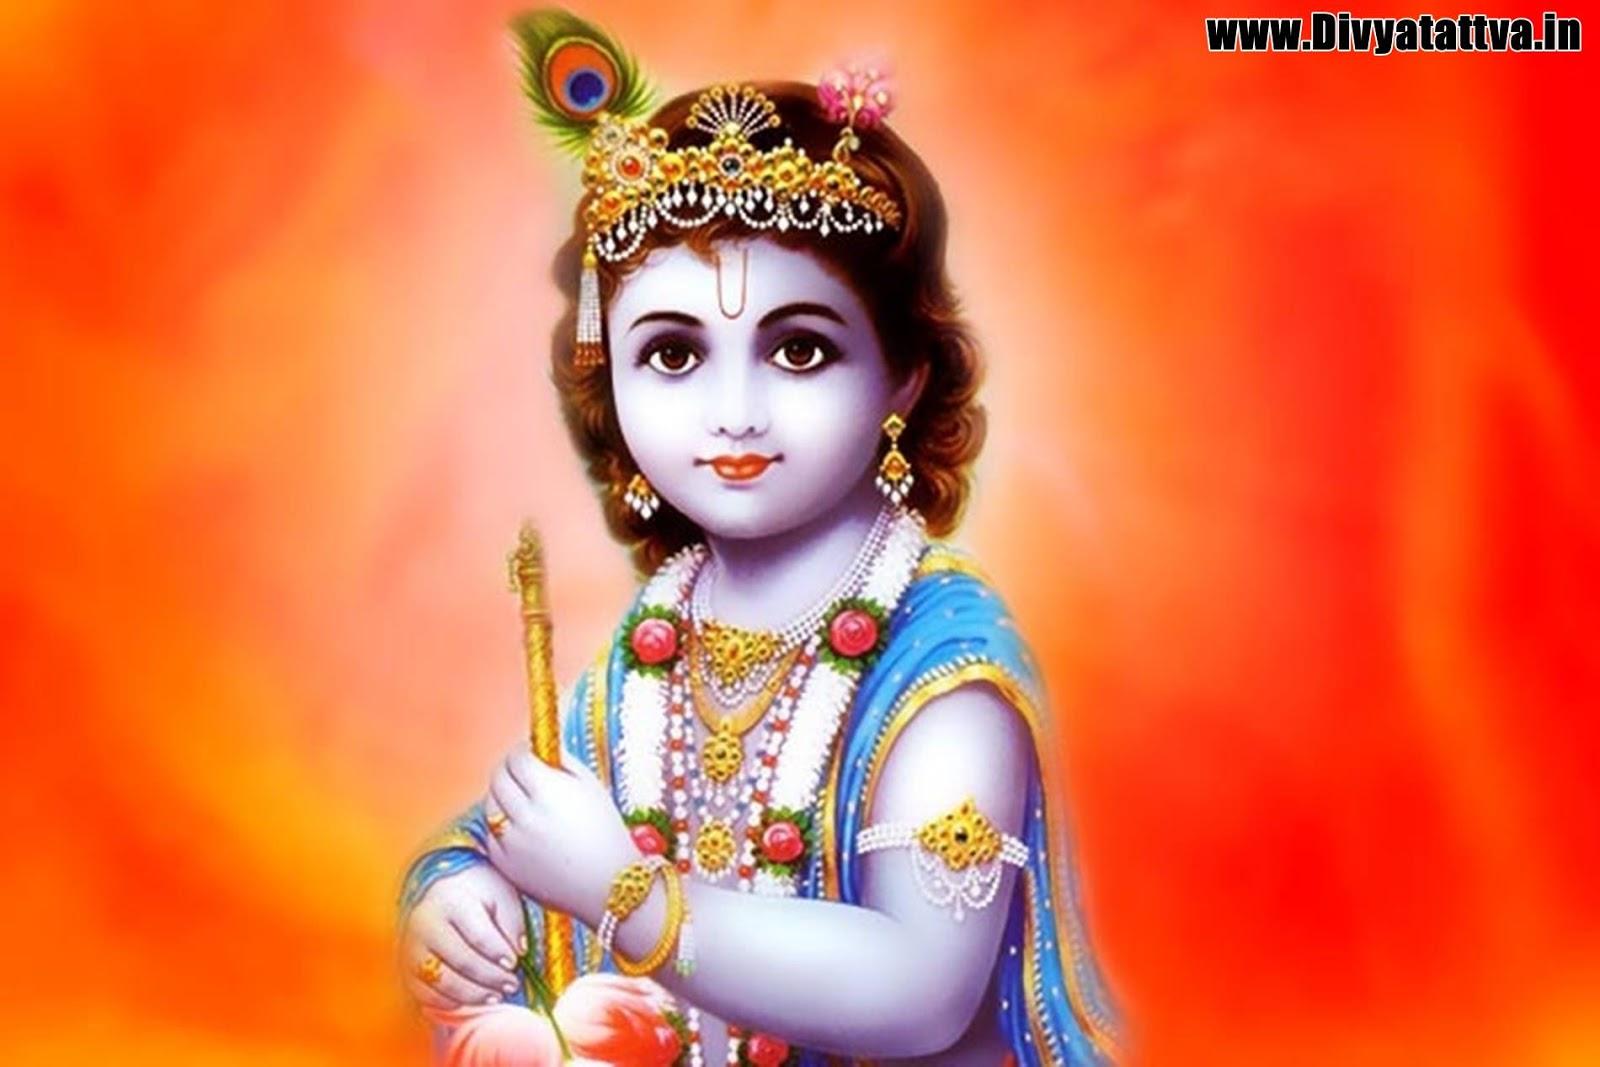 krishna baby child photo wallpaper background spiritual hindu god www.divyatattva.in